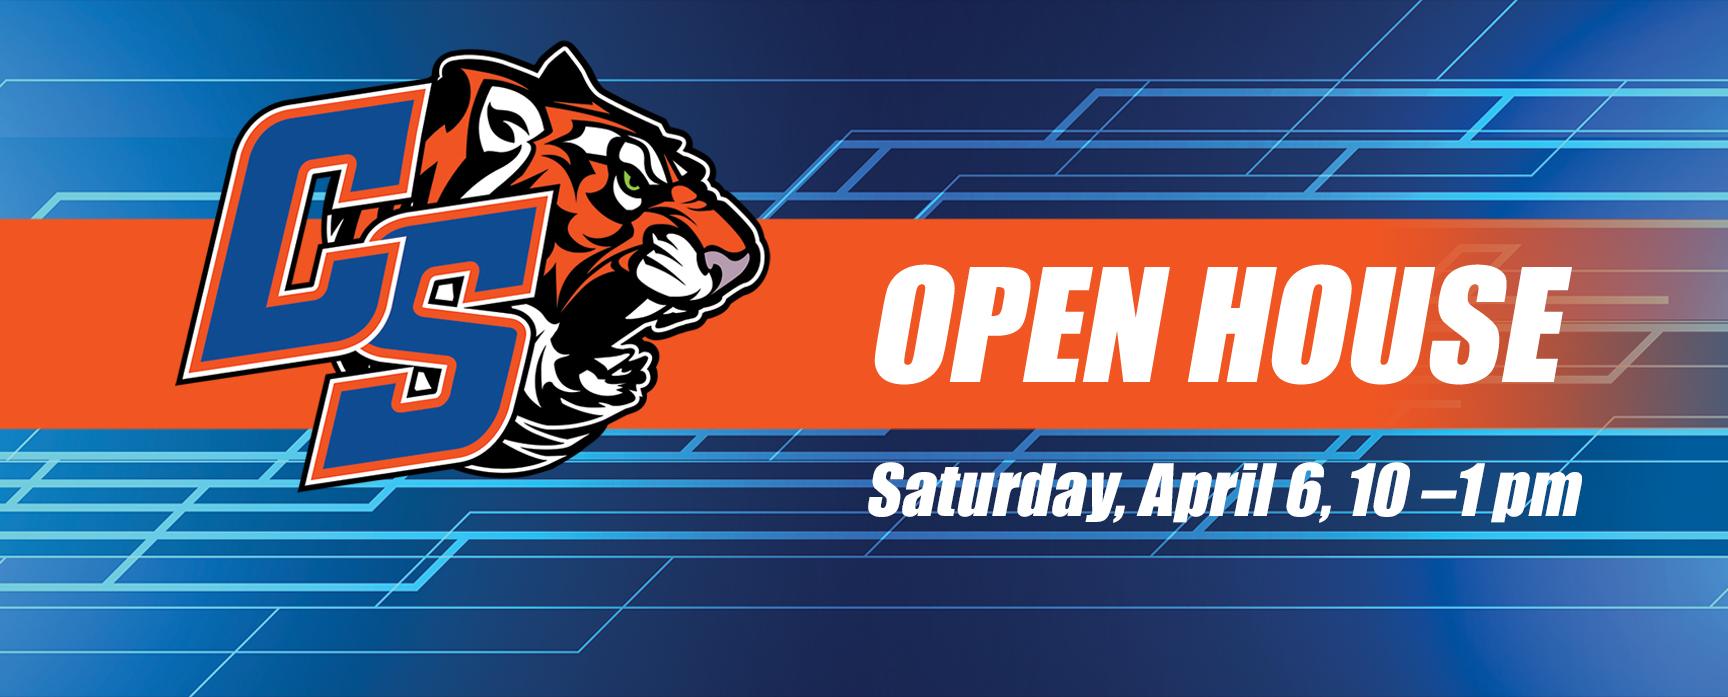 Open House, Saturday April 6th (10am -1pm)